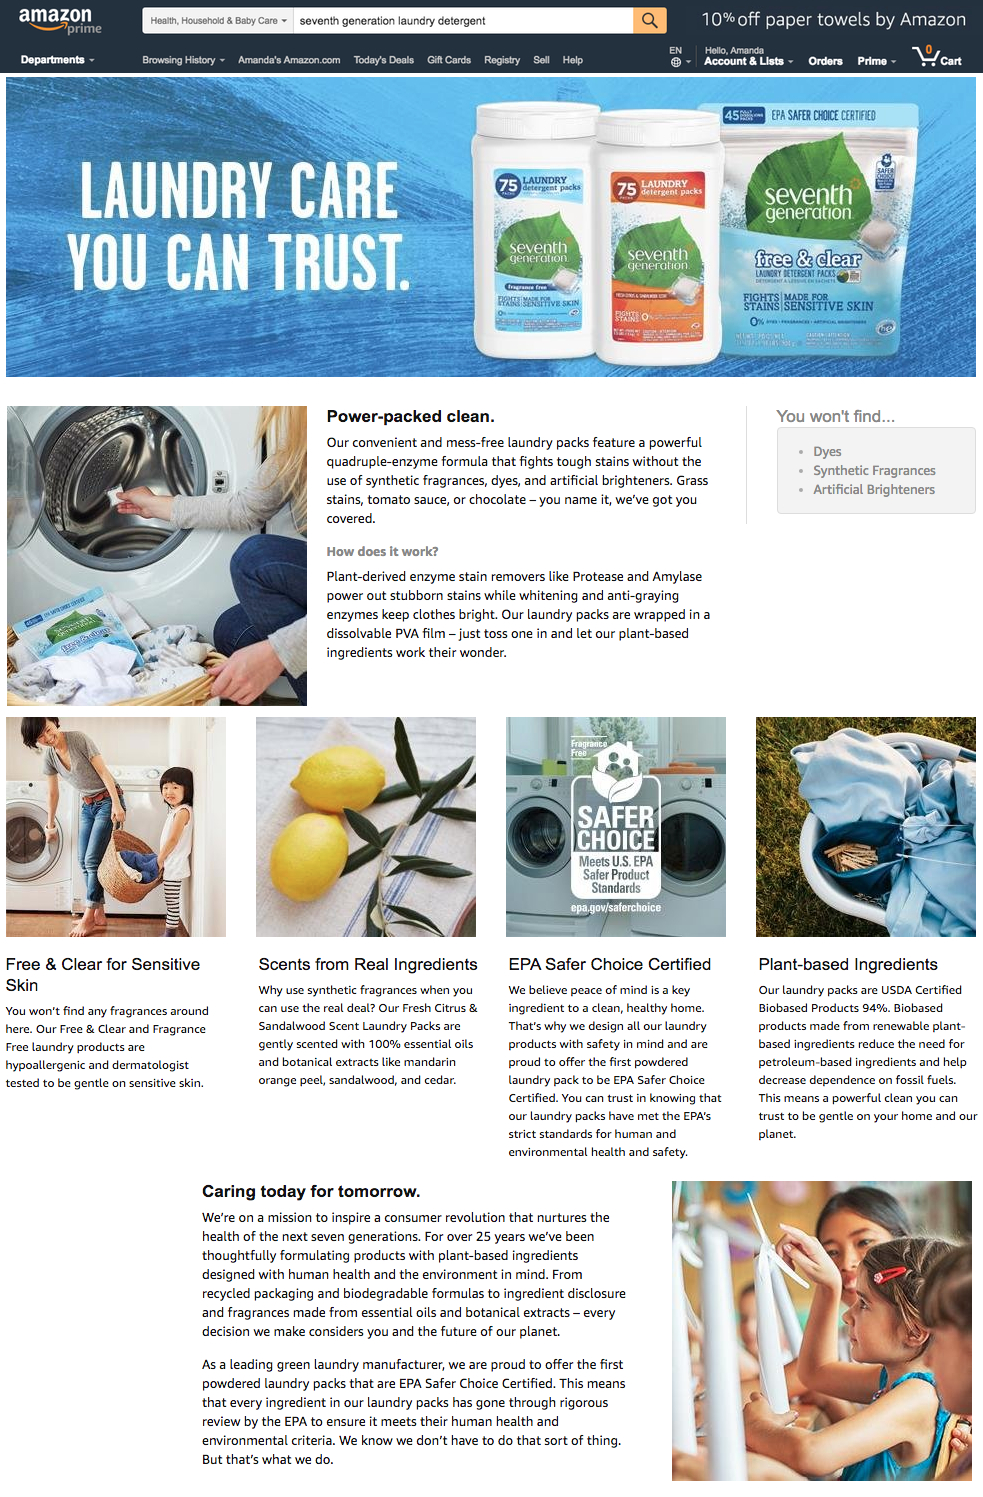 Seventh Generation Amazon A+ Laundry Detergent Amanda Wormann.jpg